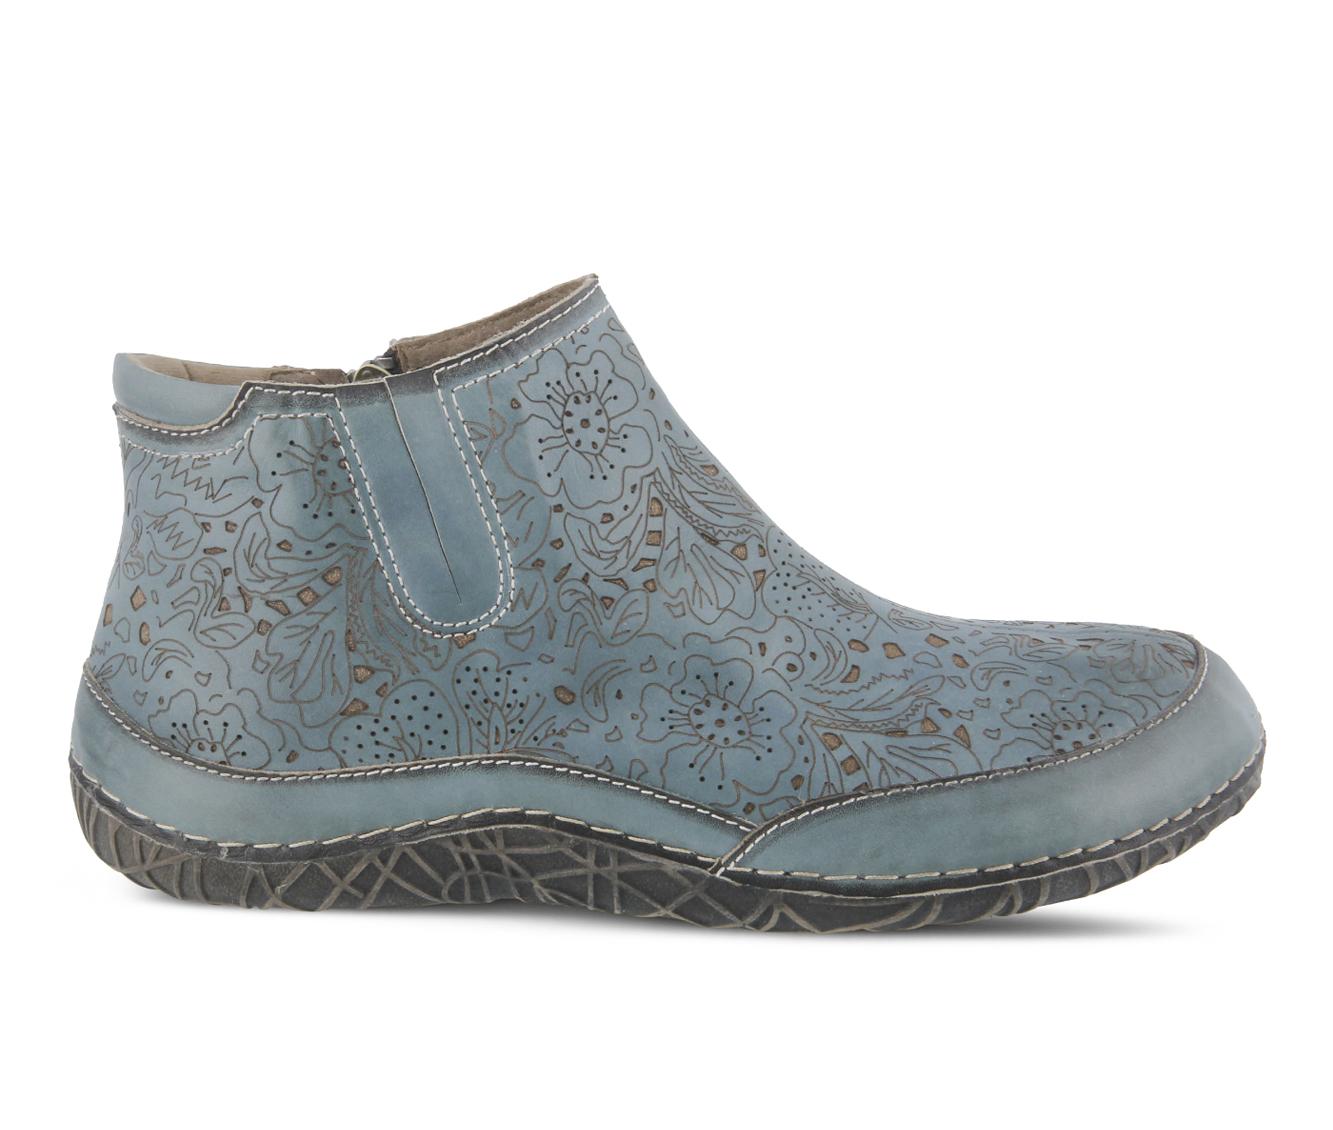 L'Artiste Libootie Women's Boots (Green Leather)